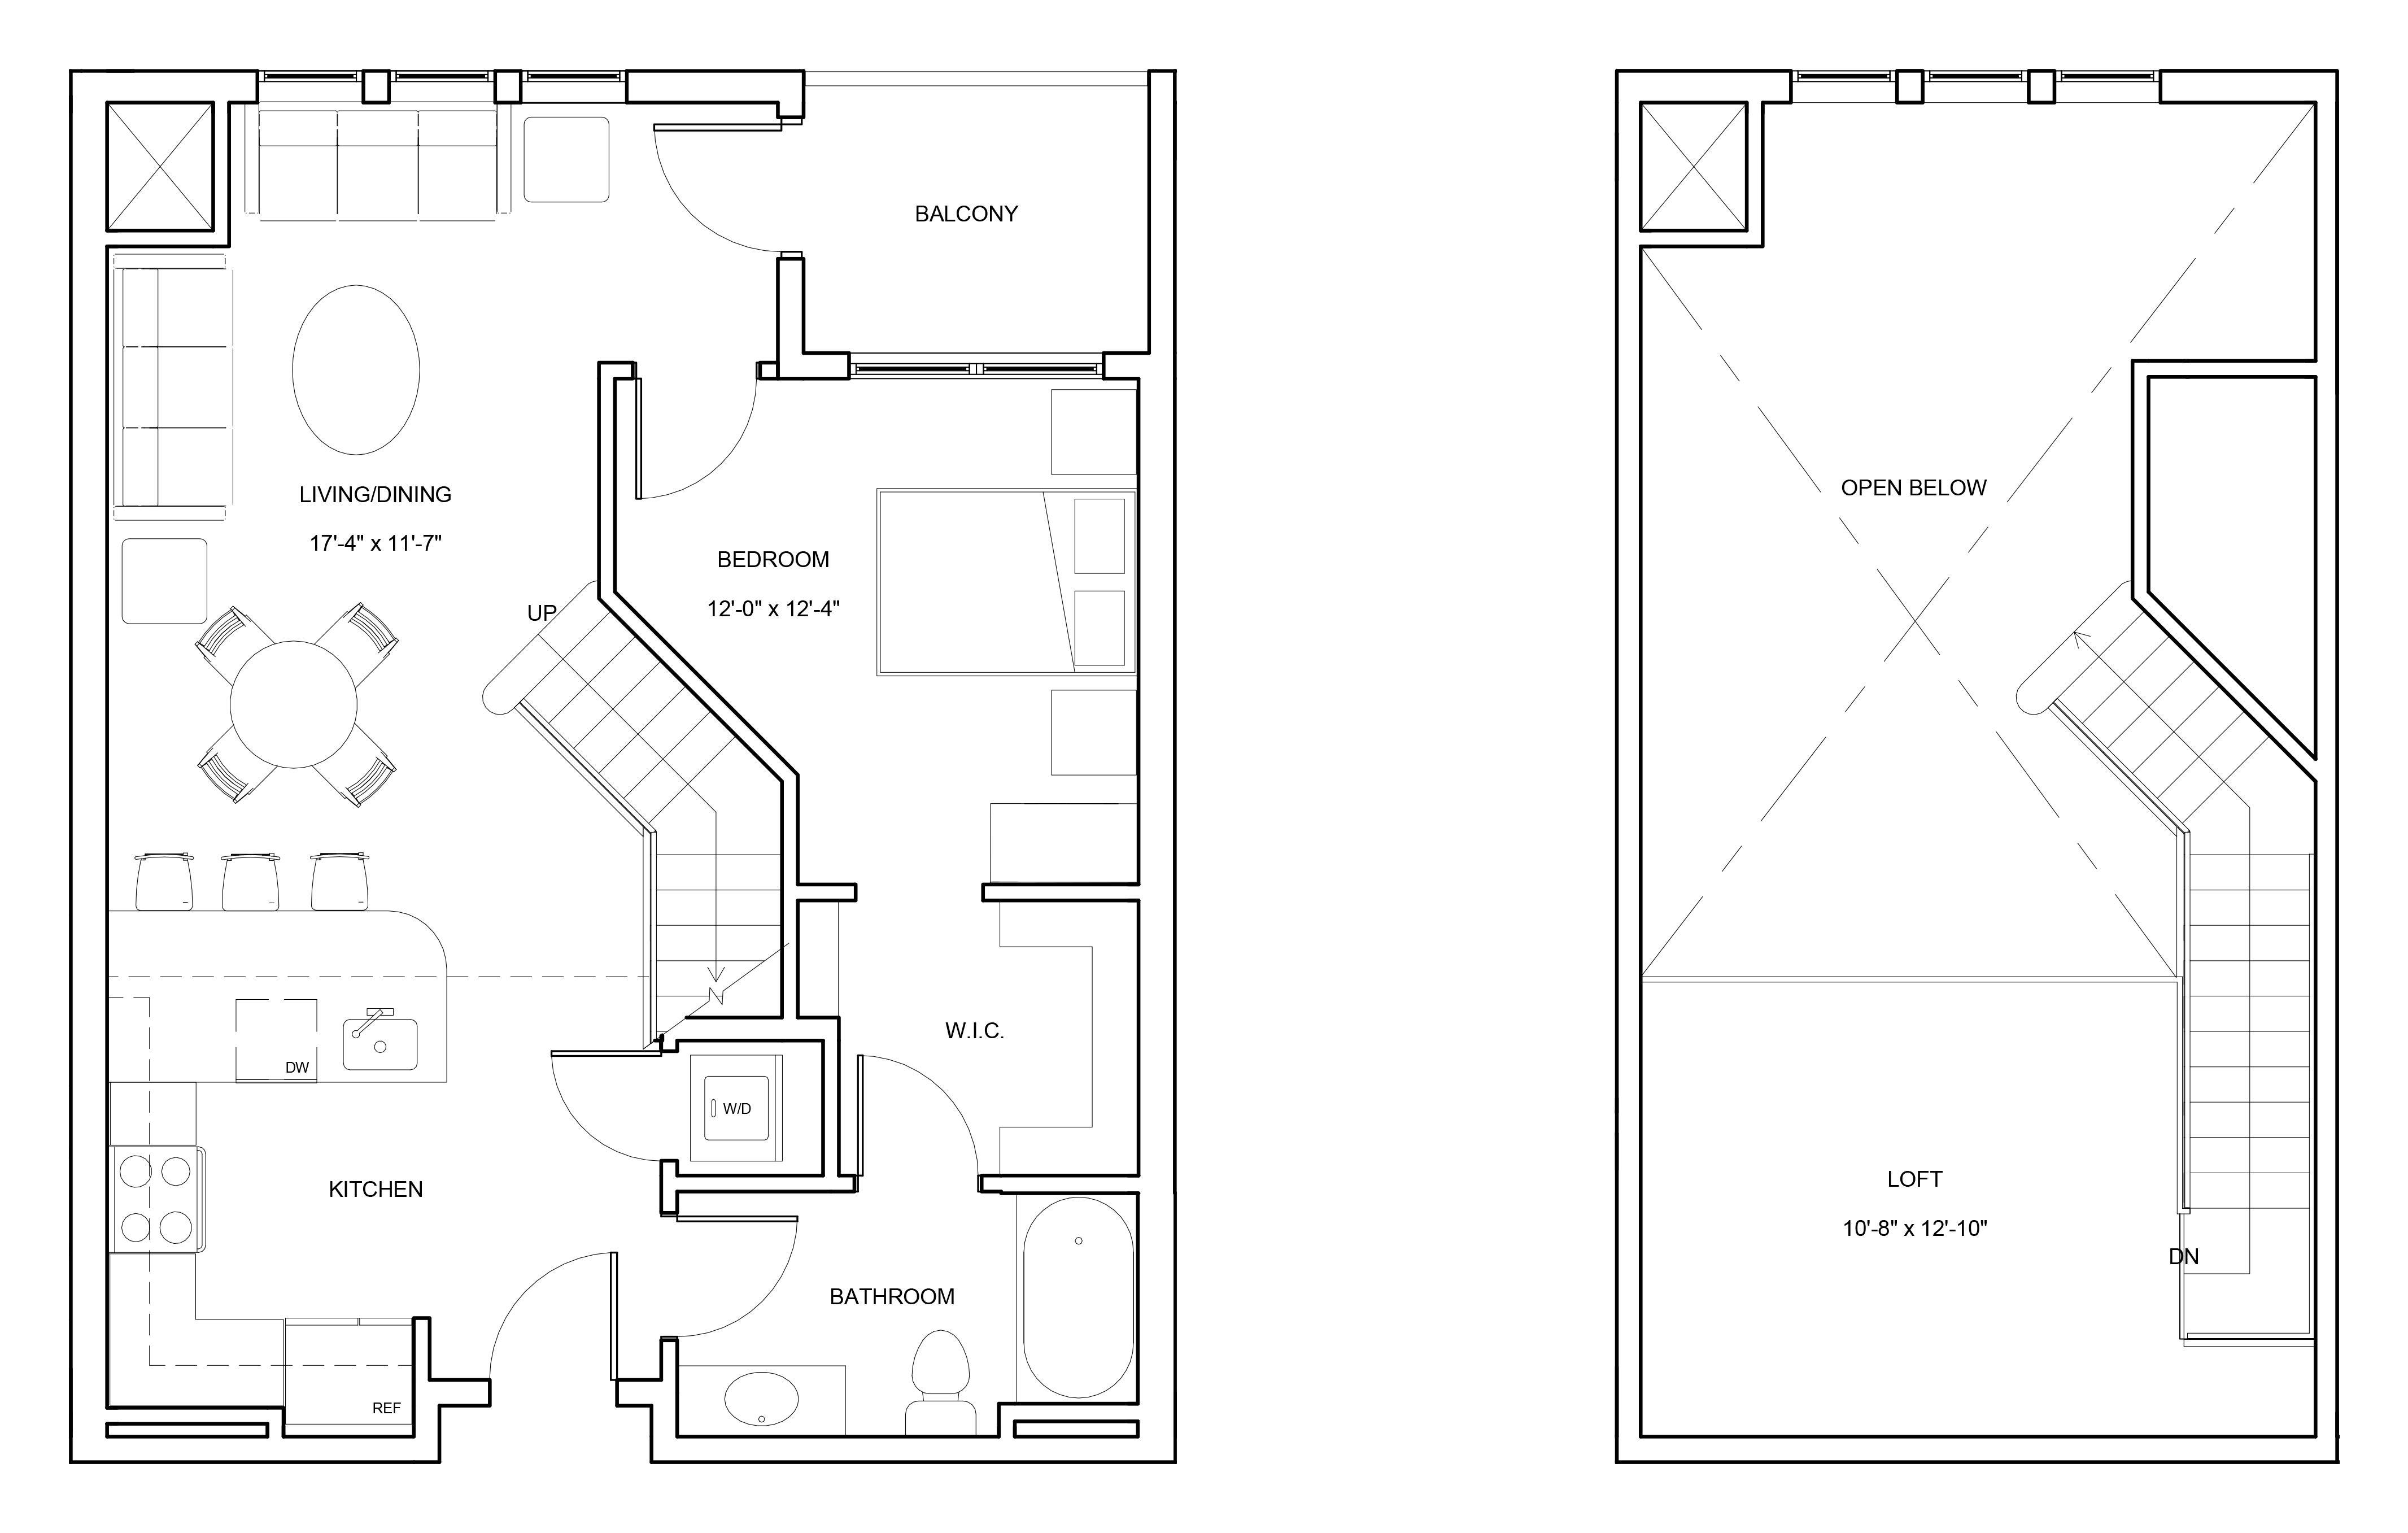 P0663804 a2bl 2 floorplan